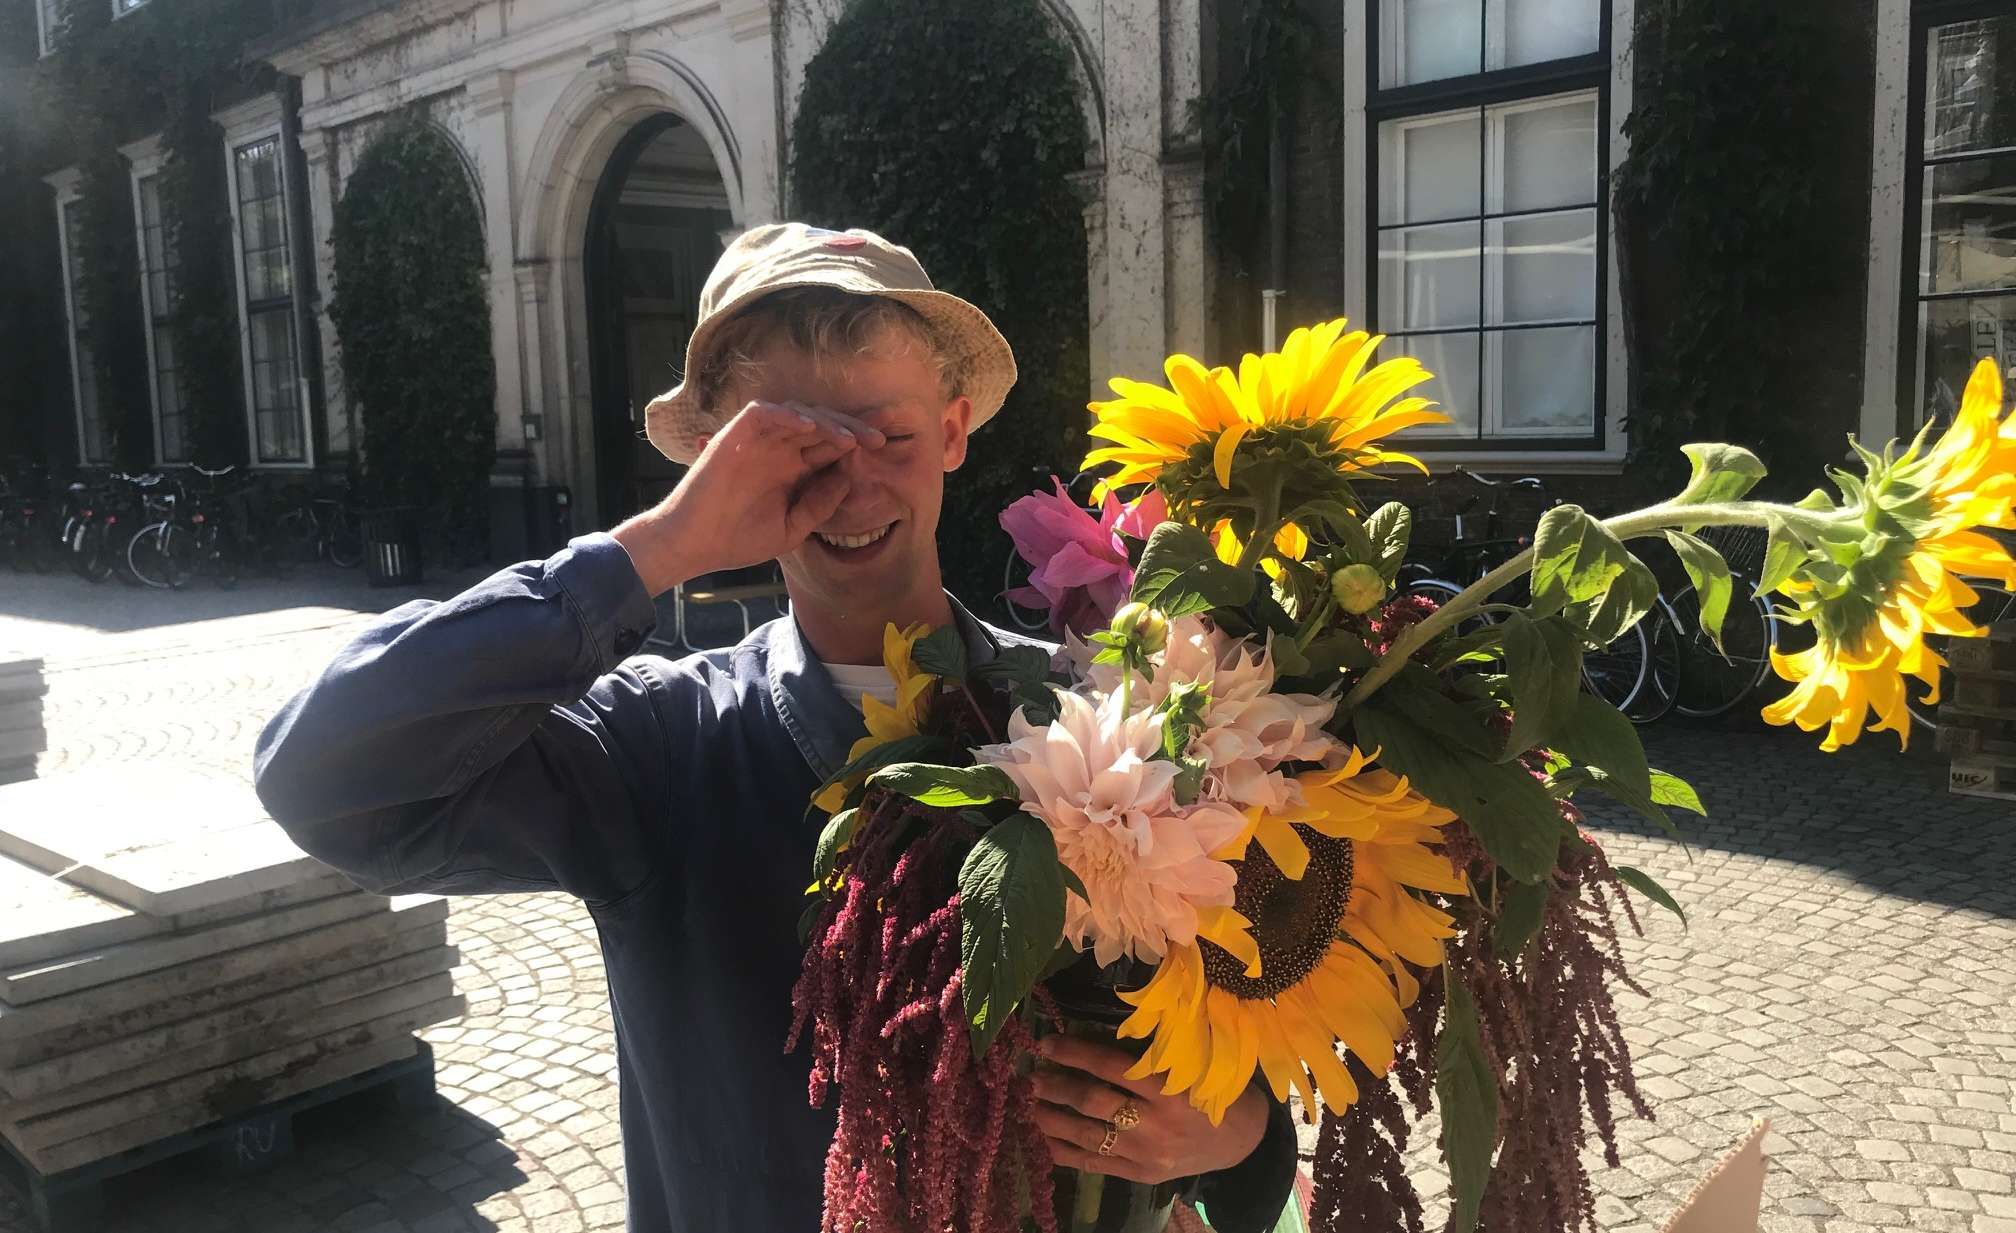 Blomster, blomster, blomster: Florist Christian Ravnbak hjælper dig i gang